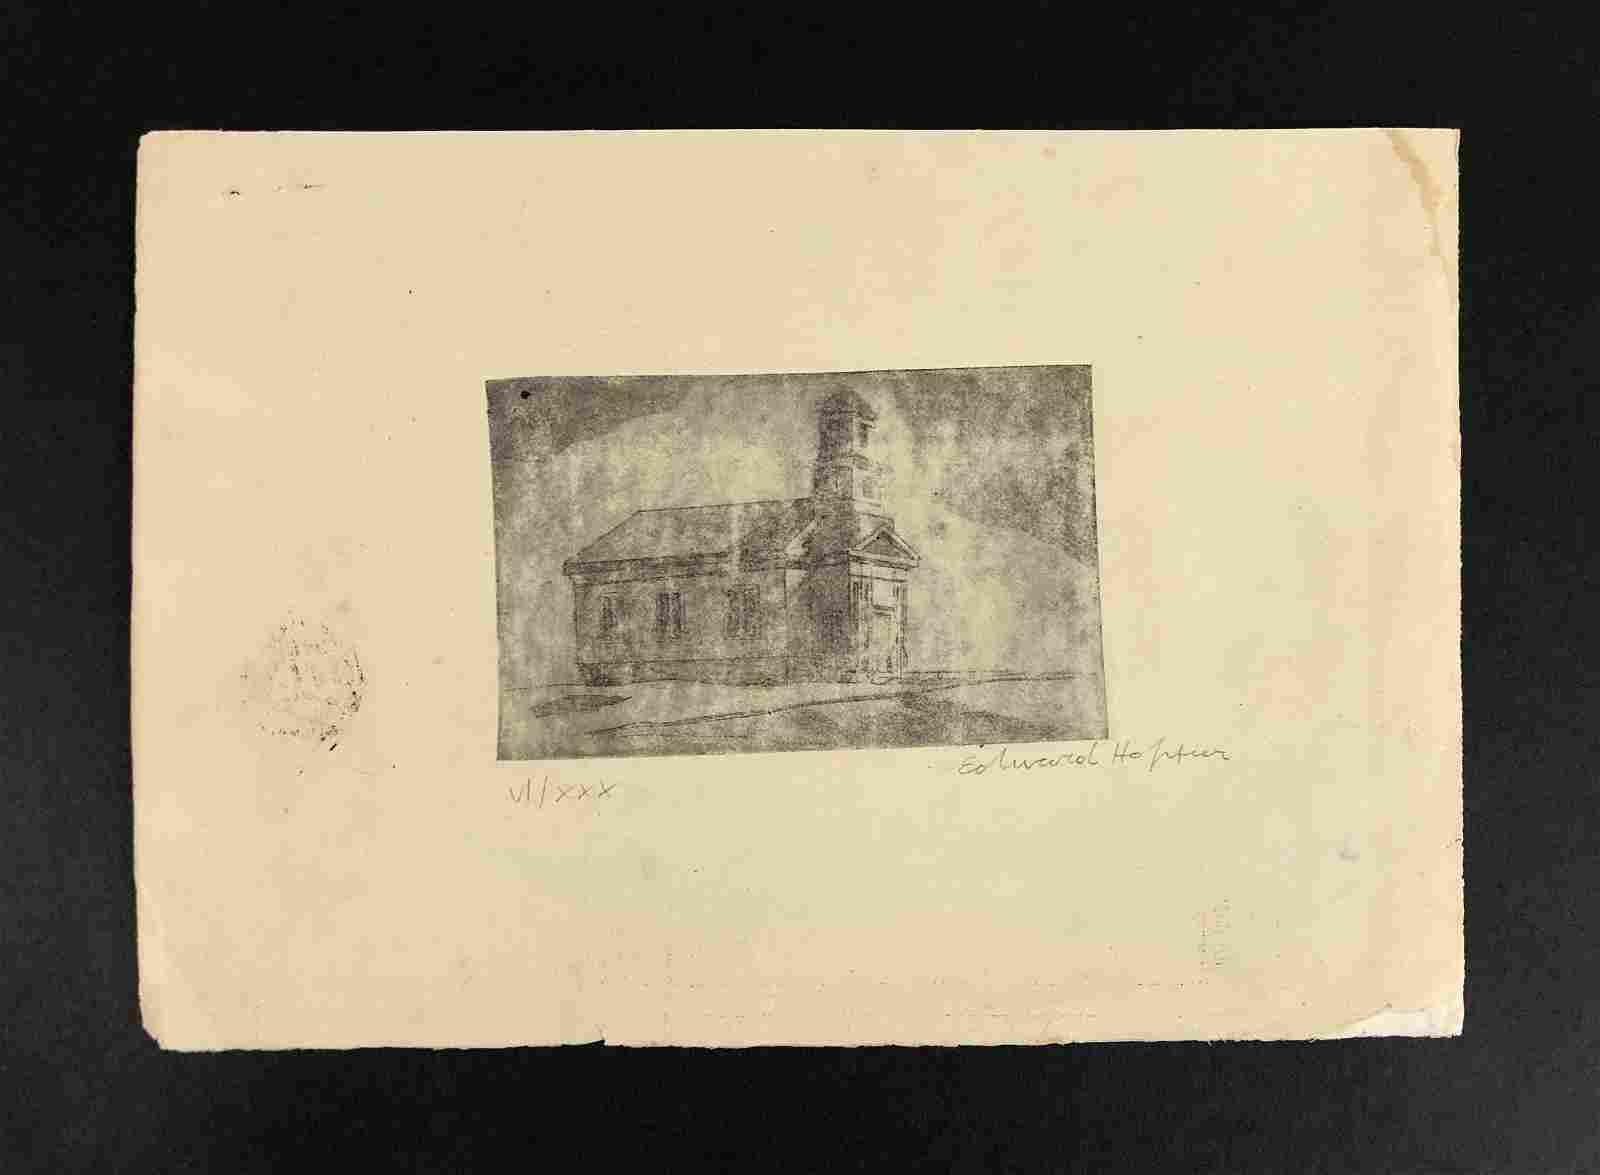 Edward Hopper (American, 1882-1967) - Fine Art Print on